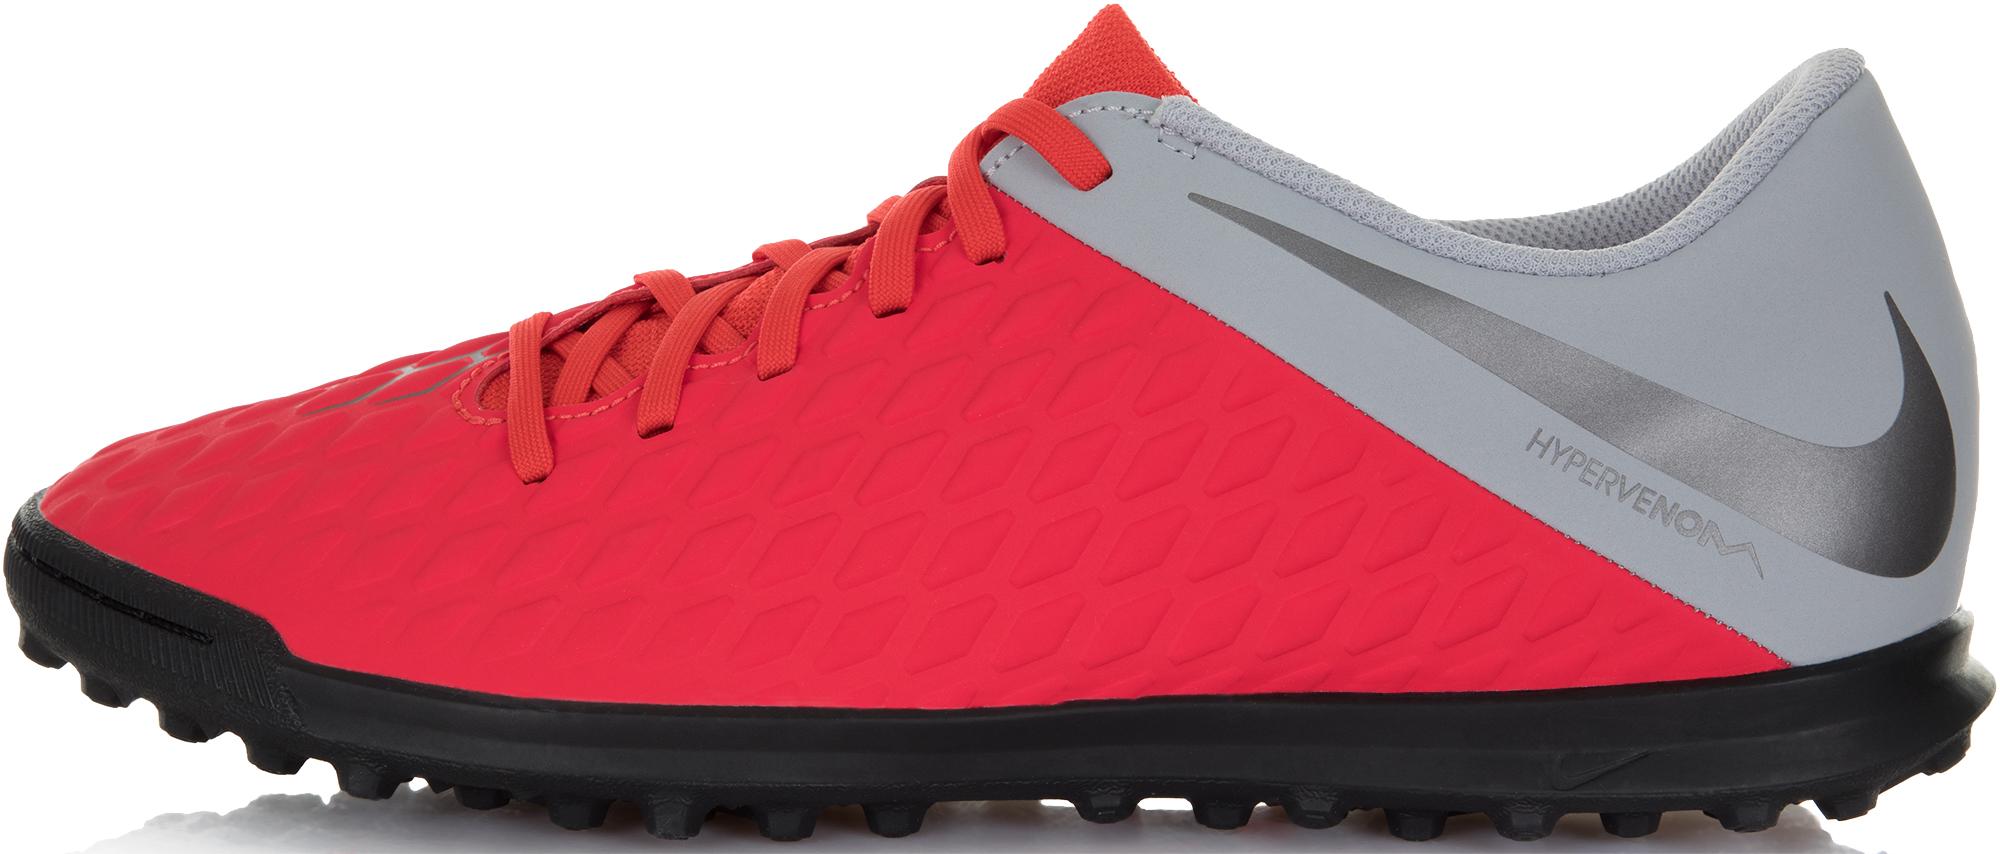 Nike Бутсы мужские Nike Hypervenom 3 Club TF, размер 44,5